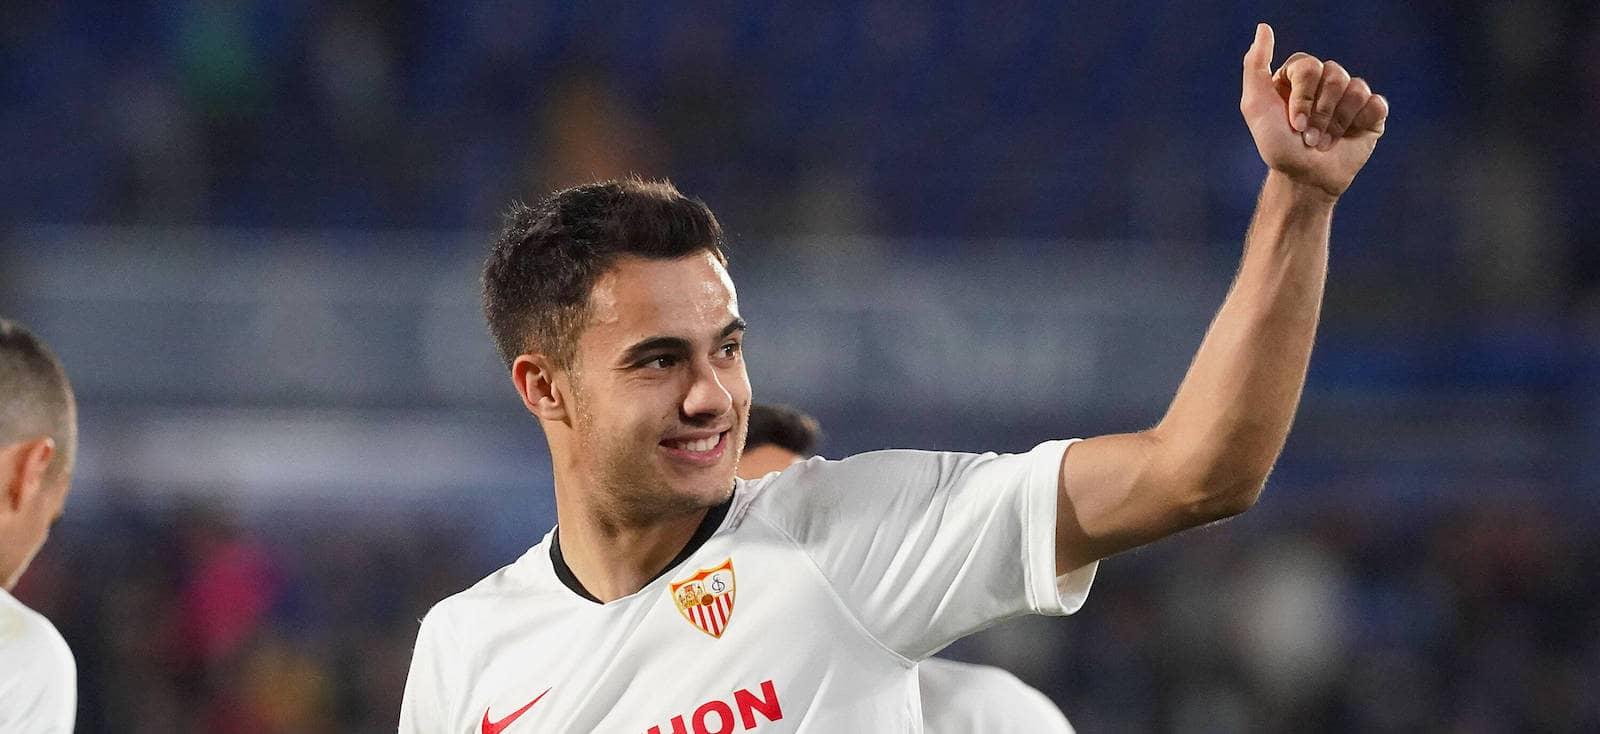 Fabrizio Romano confirms Tottenham Hotspur have leapfrogged Manchester United